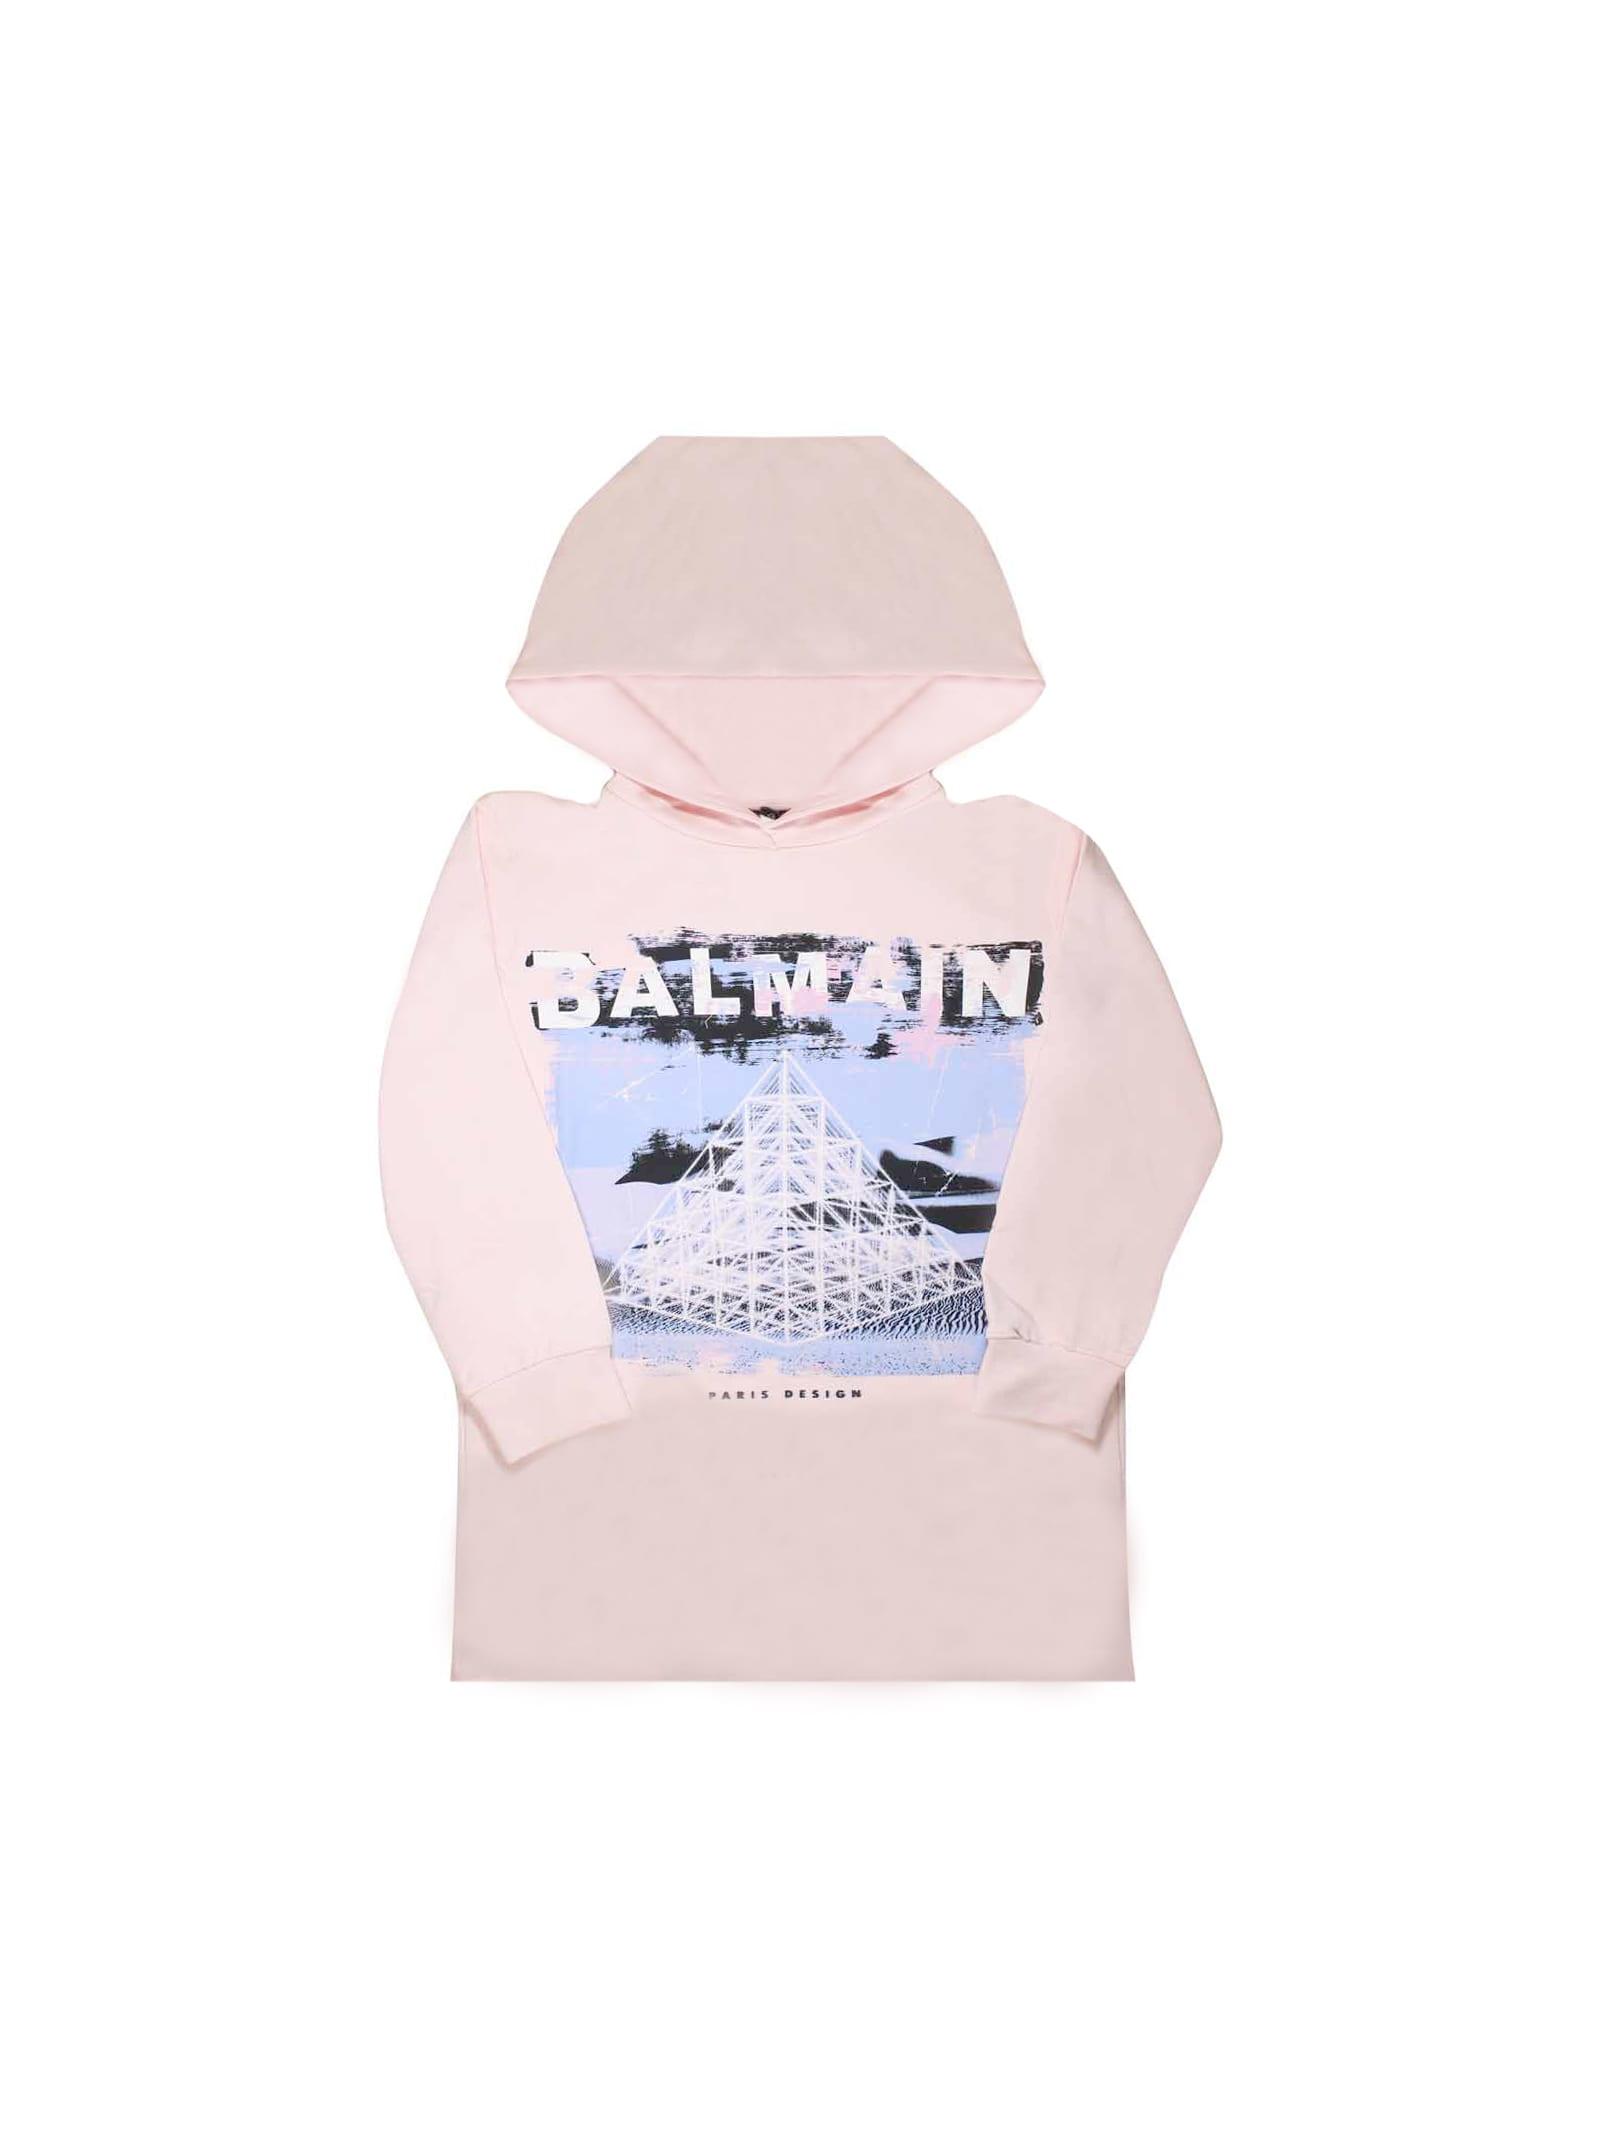 Balmain Pink Sweatshirt Dress Teen